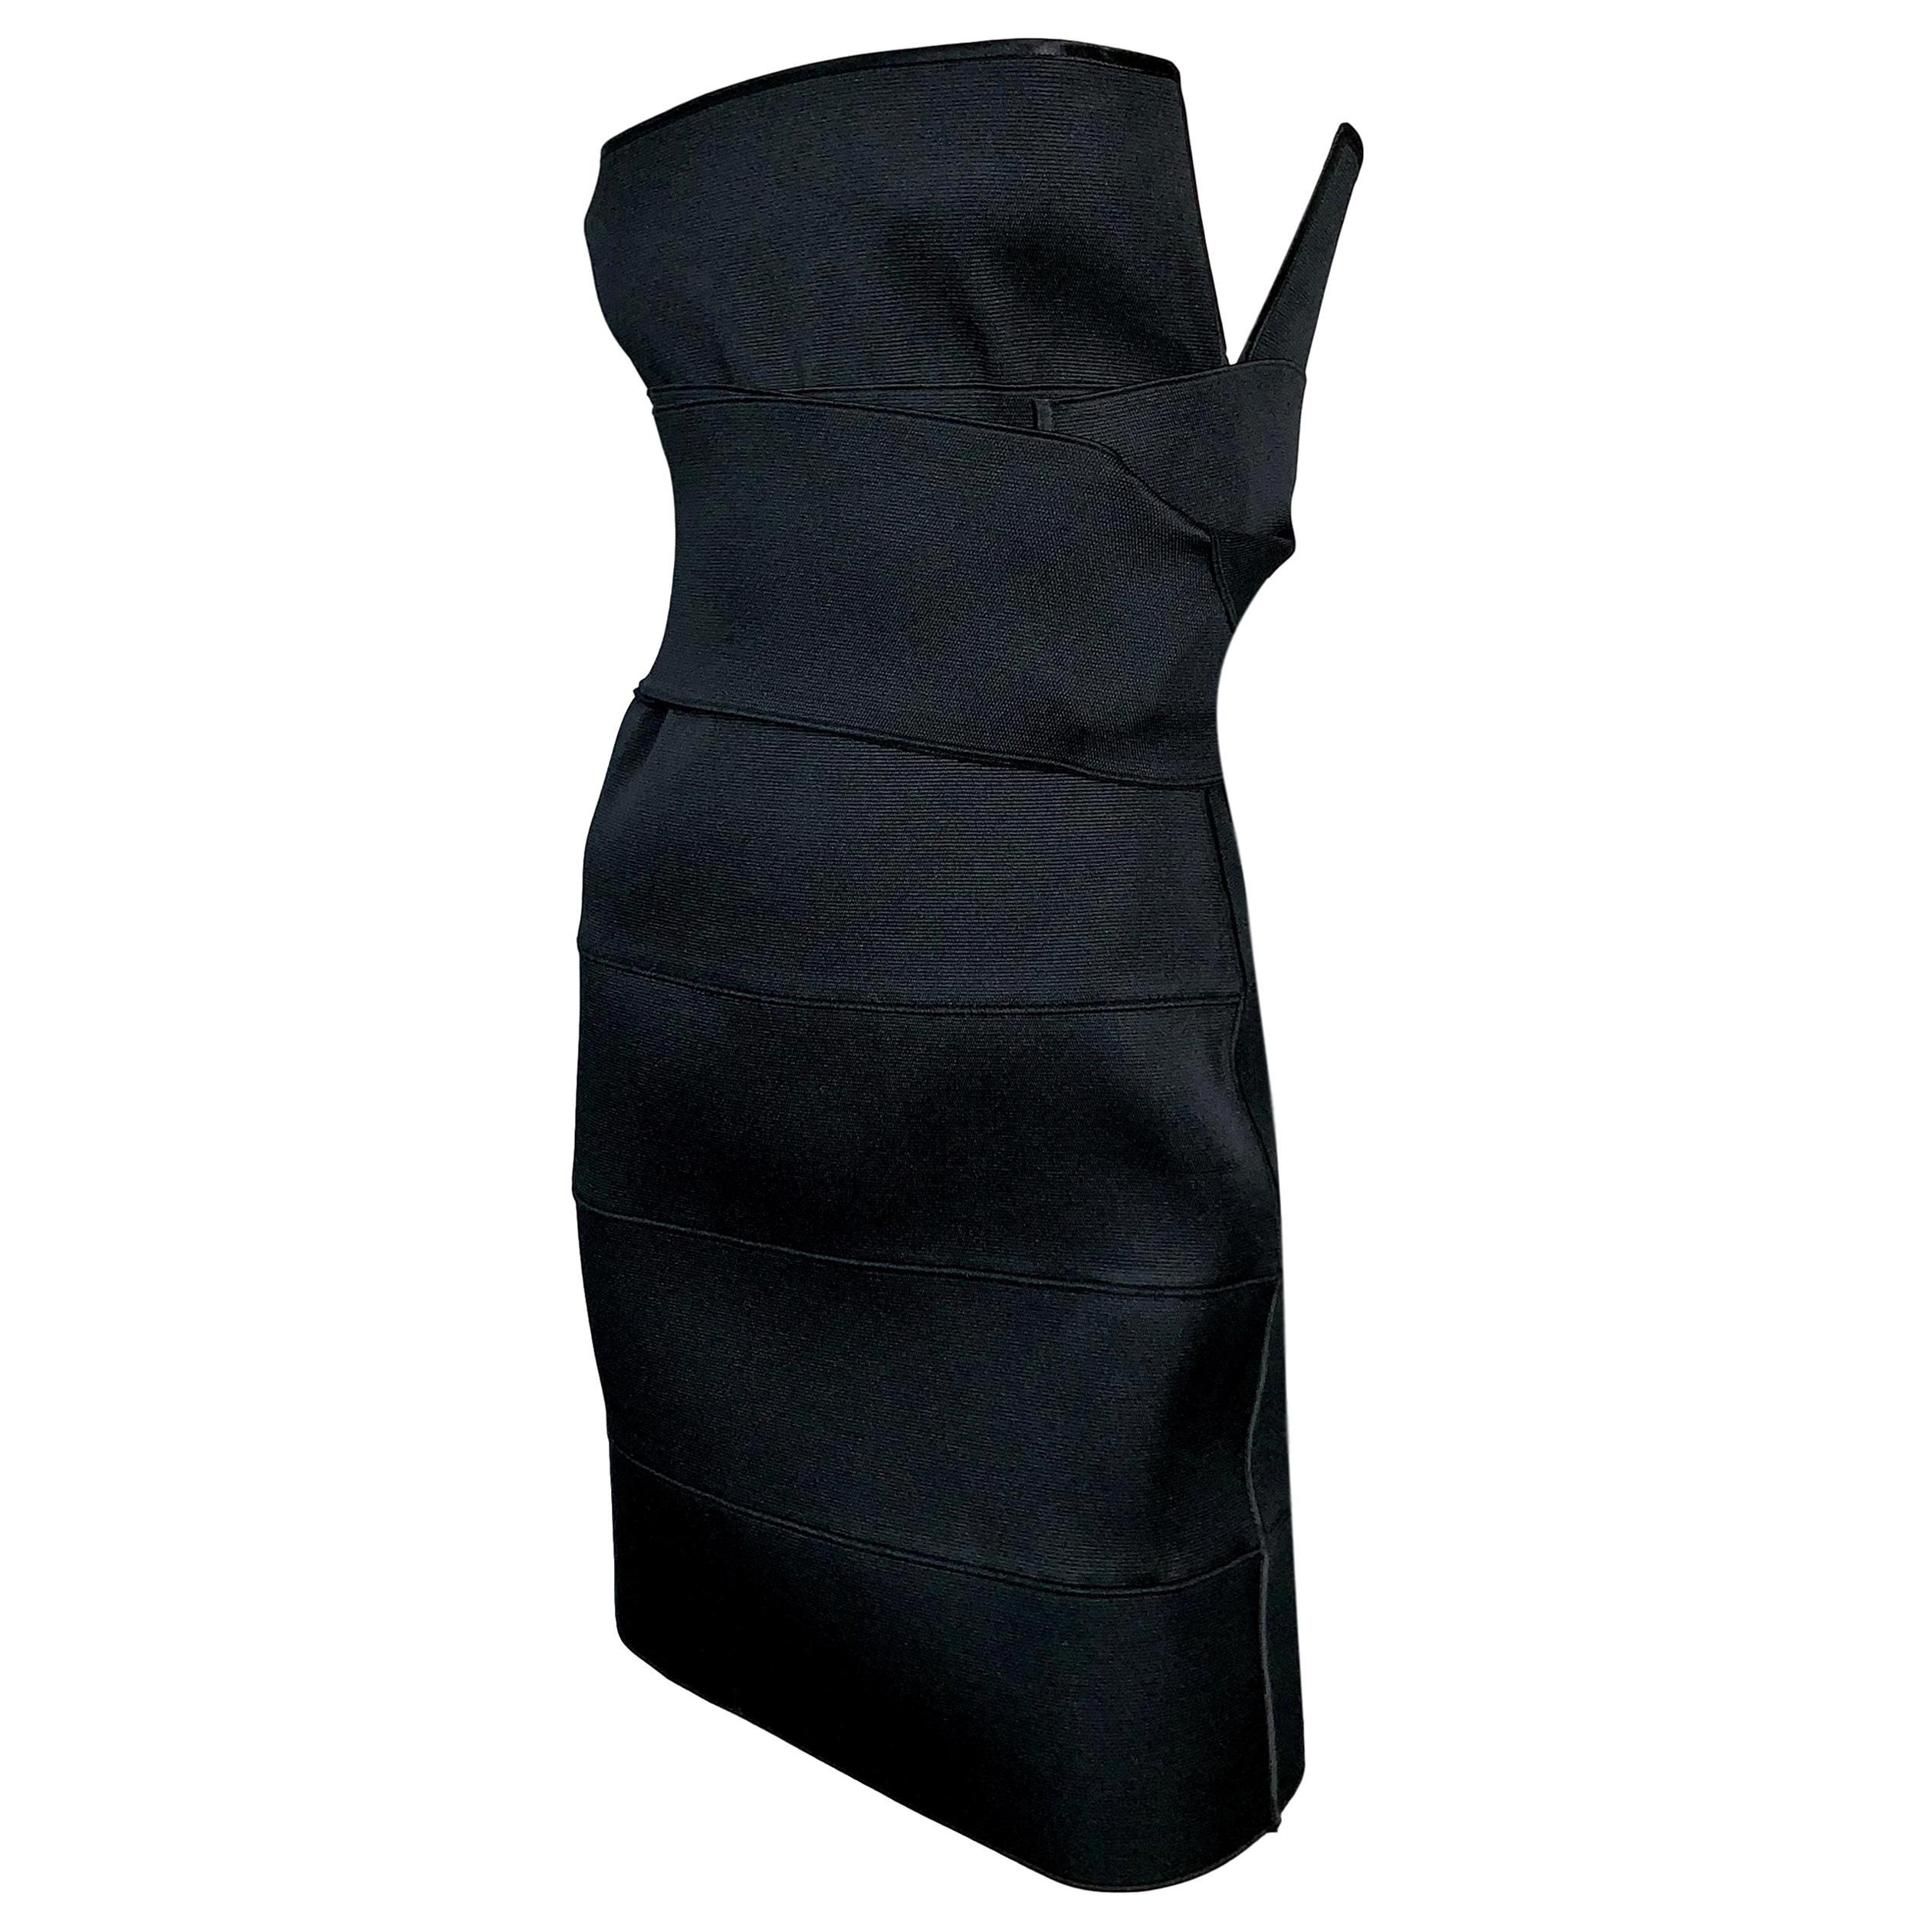 S/S 2001 Yves Saint Laurent Tom Ford Runway Black Bandage Wrap Mini Dress